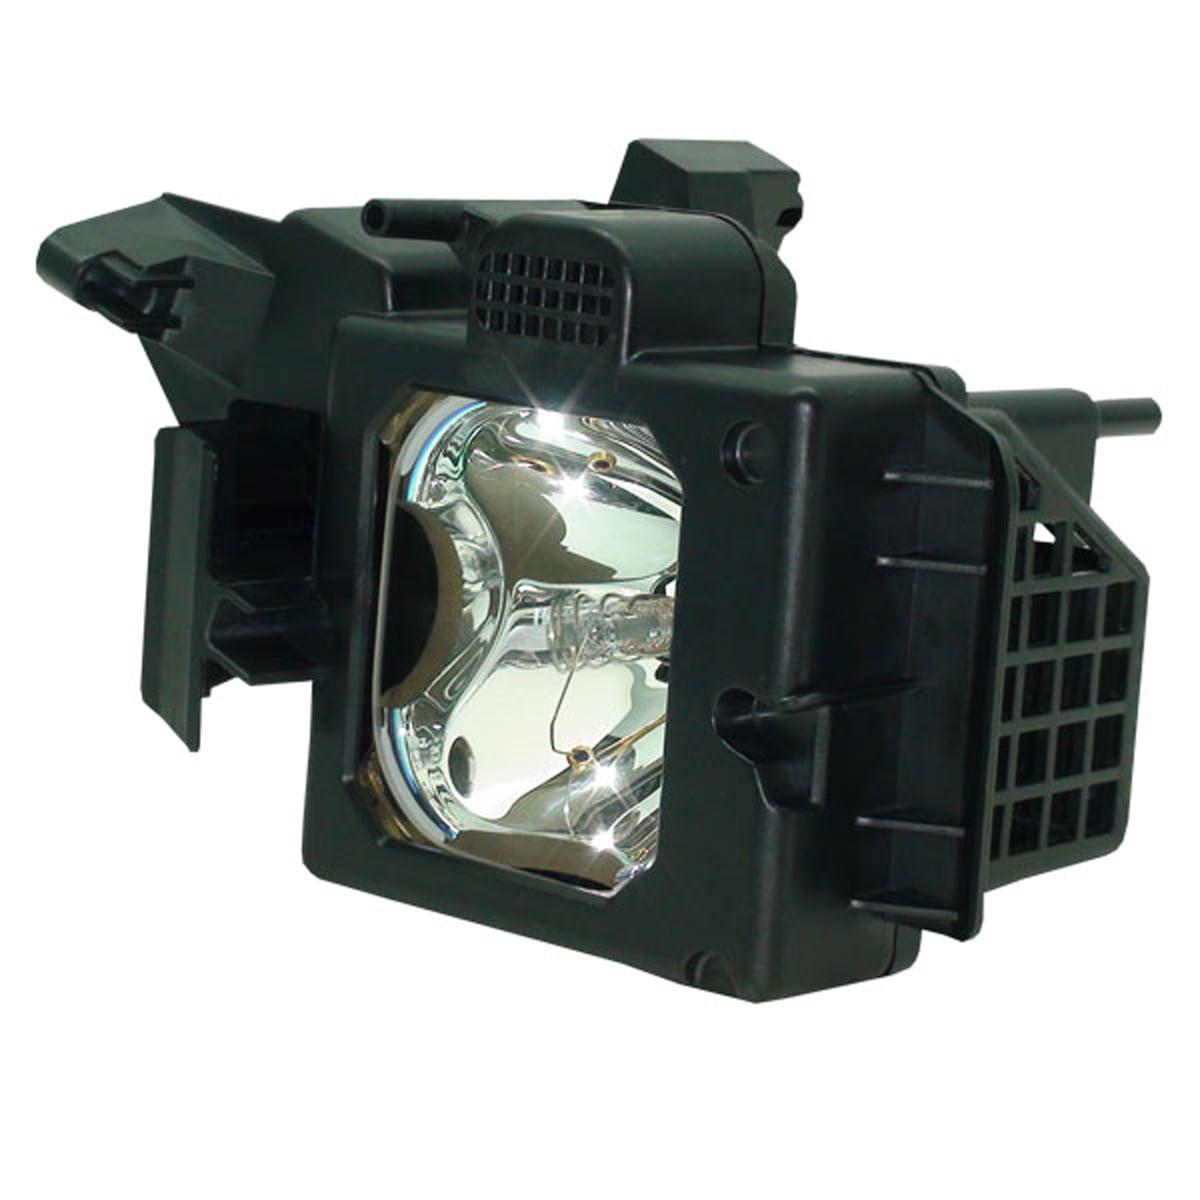 Sony XL-5000 / F-9308-720-0 Osram TV Lamp Housing DLP LCD